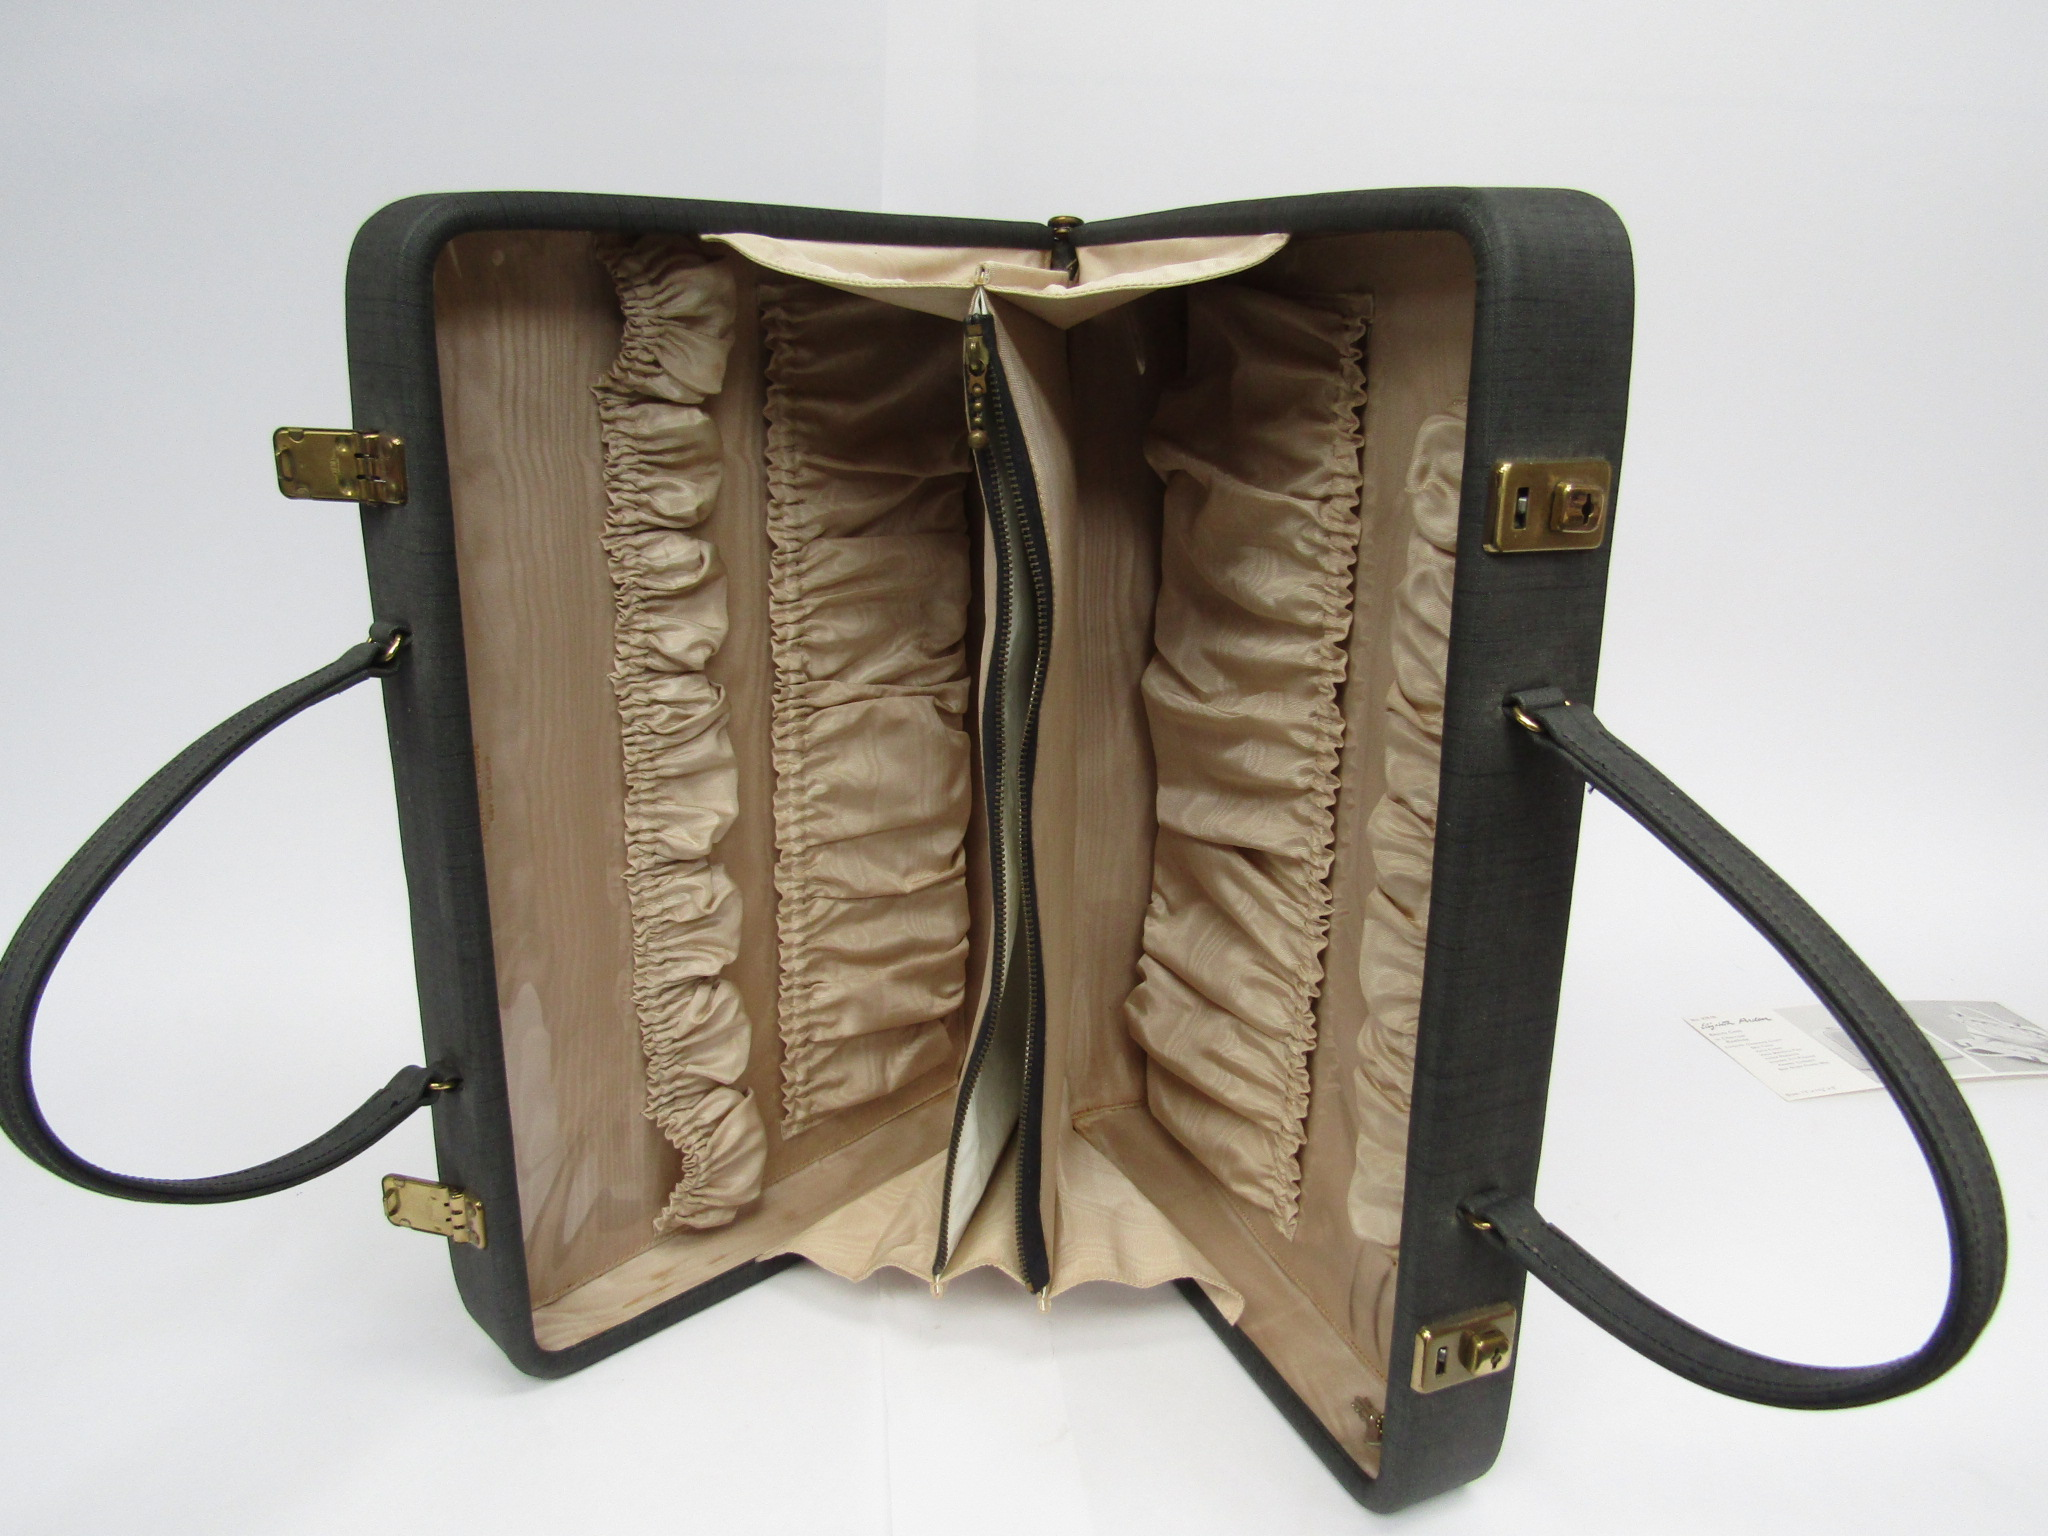 Elizabeth Arden beauty/vanity case in charcoal, beige ruched interior, - Image 2 of 3